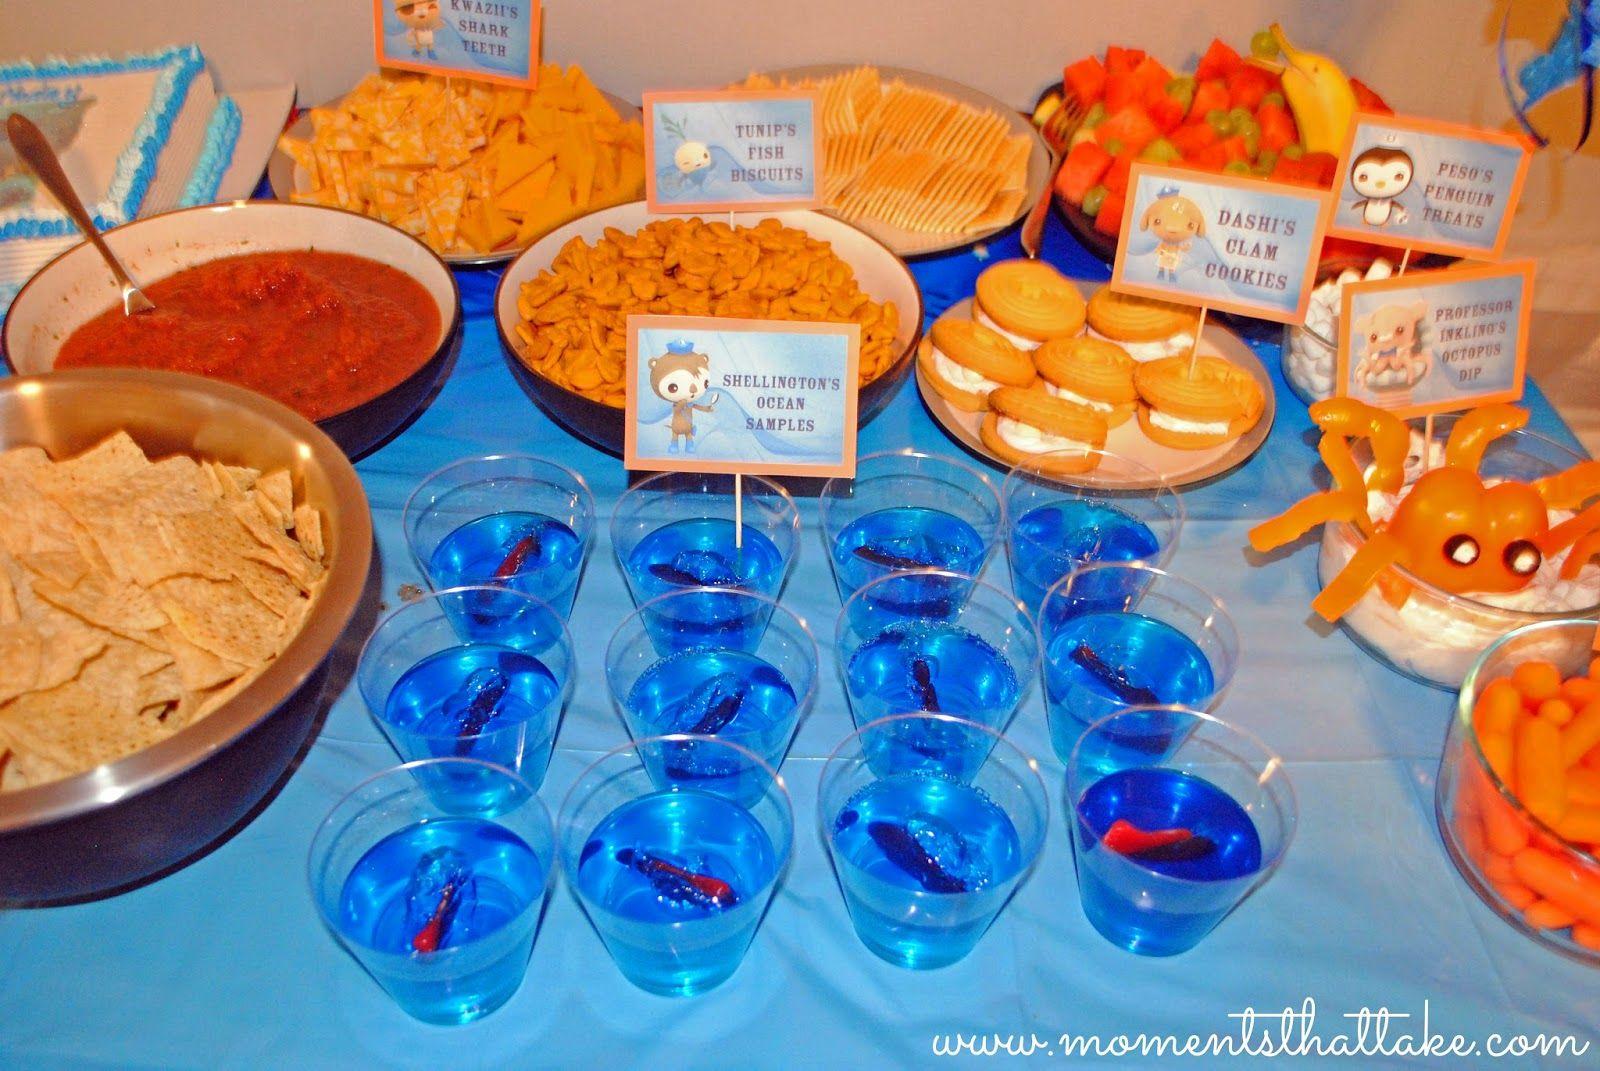 Octonauts Birthday Party Food Ideas Shellingtons Ocean Samples